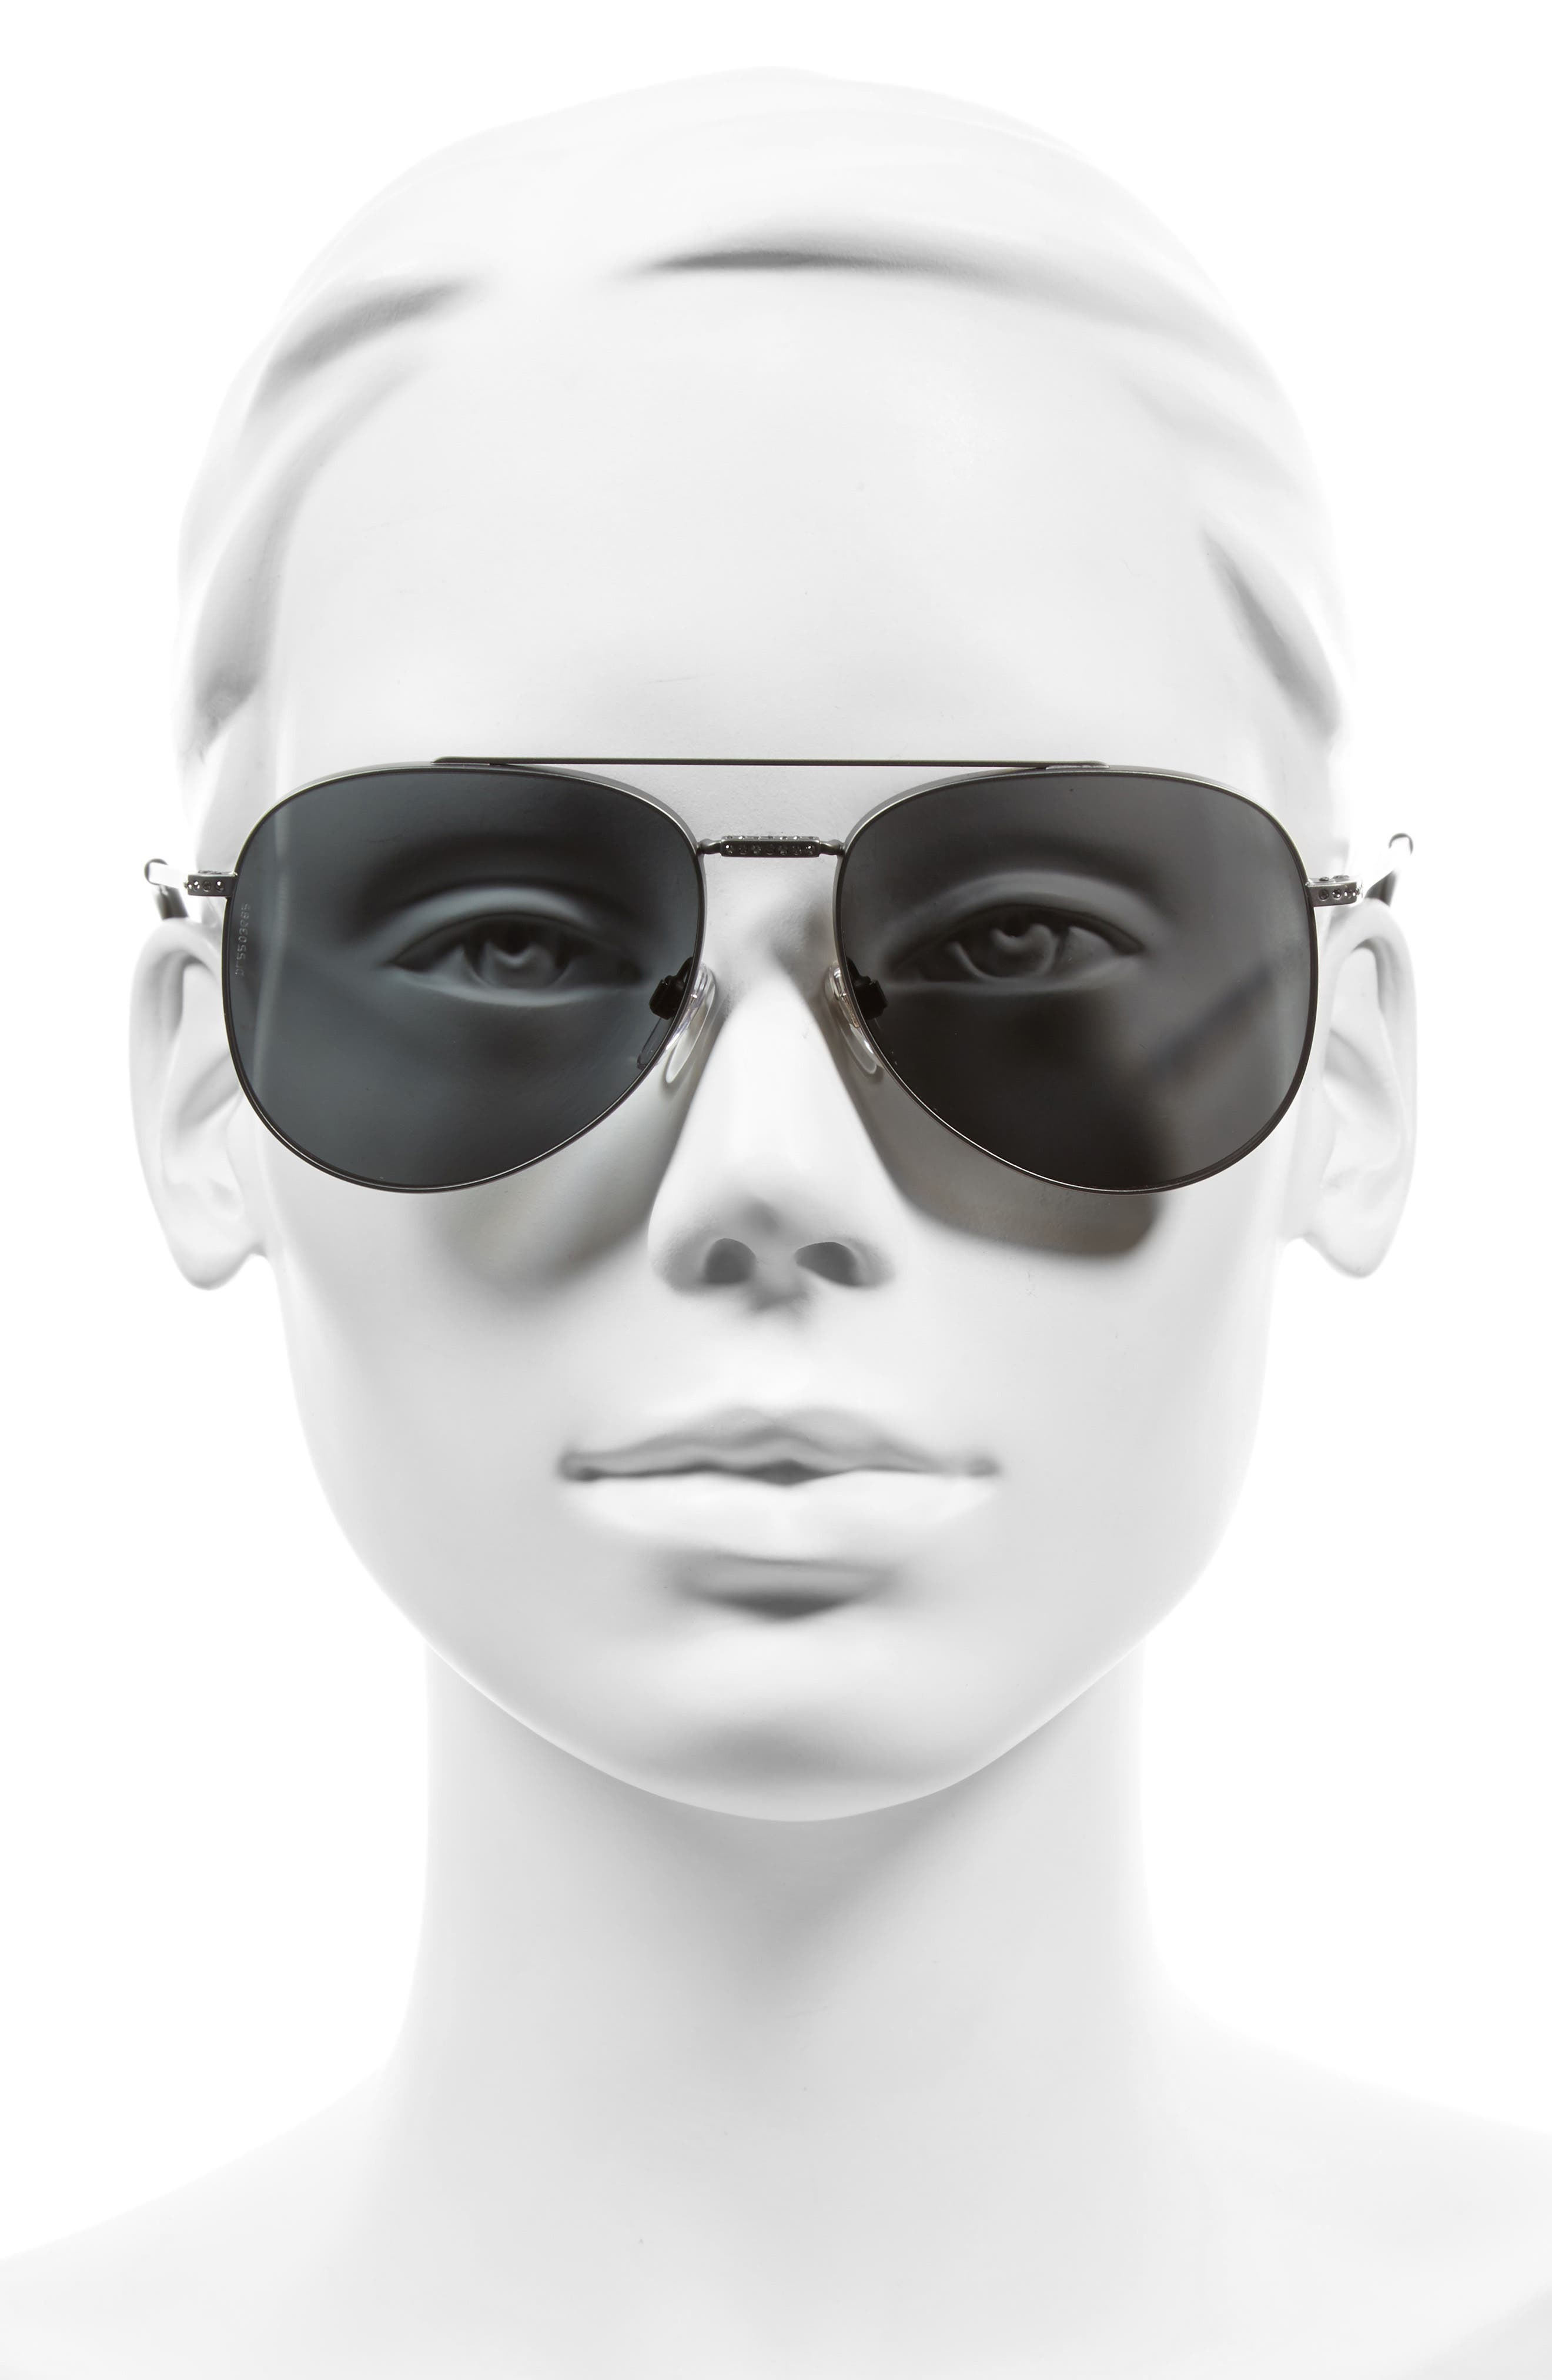 56mm Aviator Sunglasses,                             Alternate thumbnail 2, color,                             MATTE RUTHENIUM/ GREY CRYSTAL